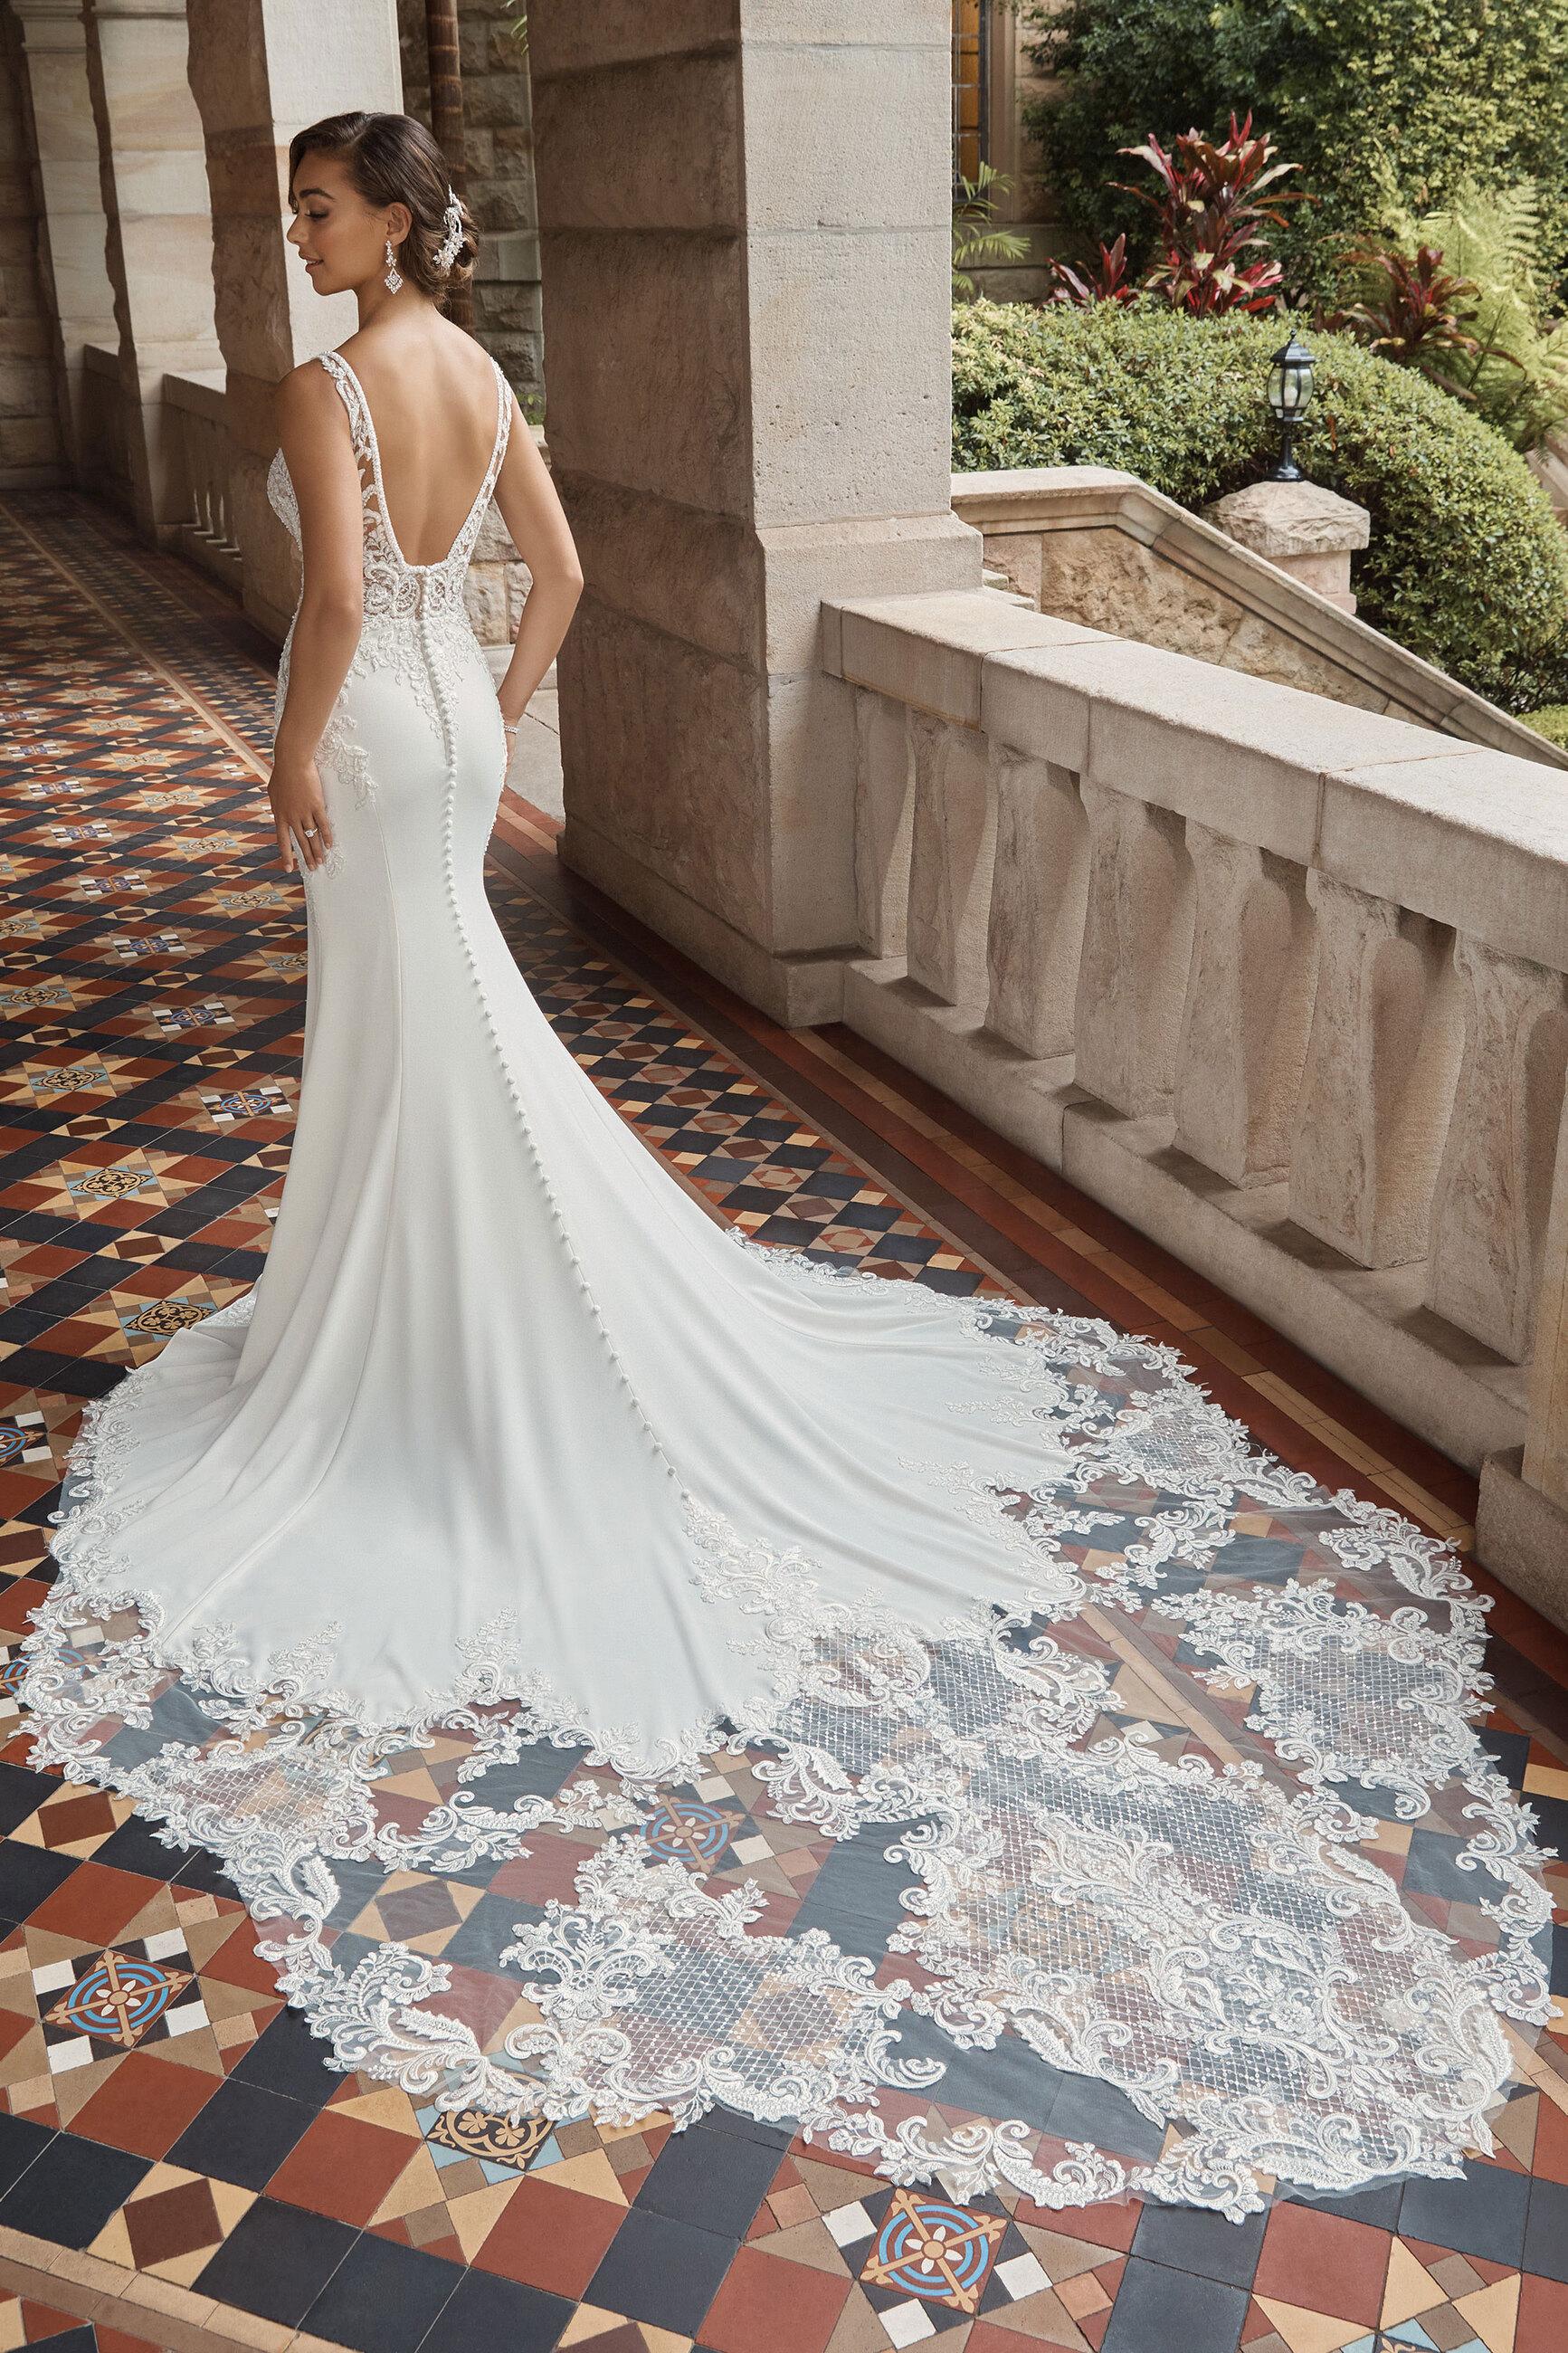 lace wedding dresses,wedding dresses lace,